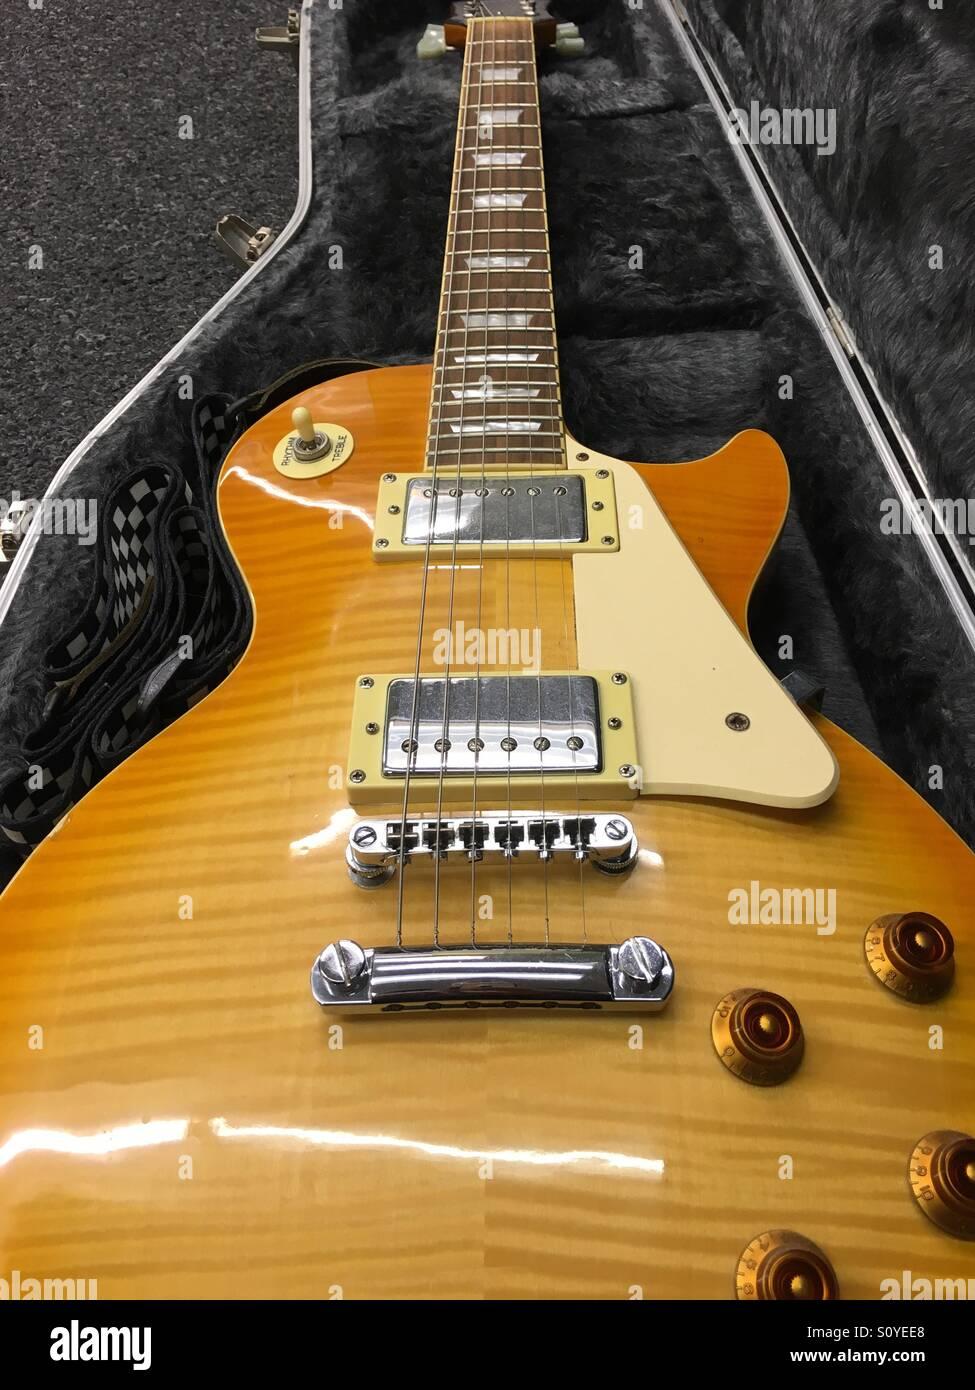 Gibson Epiphone Les Paul Custom Guitar Stock Photo 310390704 Alamy